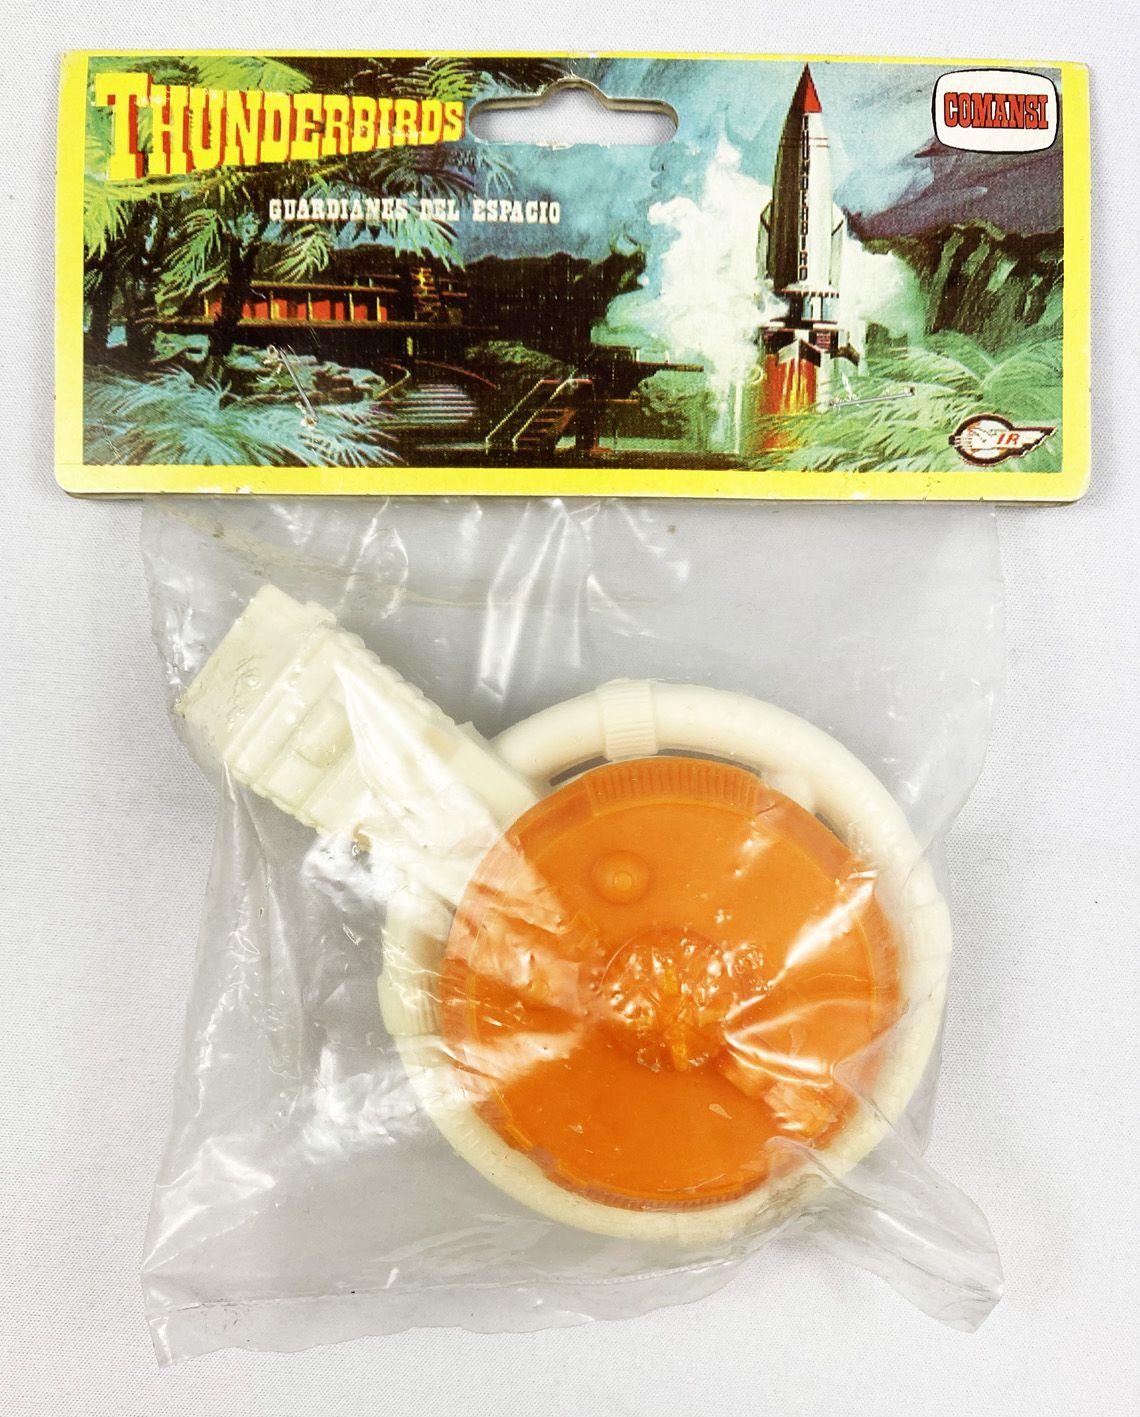 Thunderbirds - Comansi - TB5 Plastique 10cm (Neuf sous Sachet)